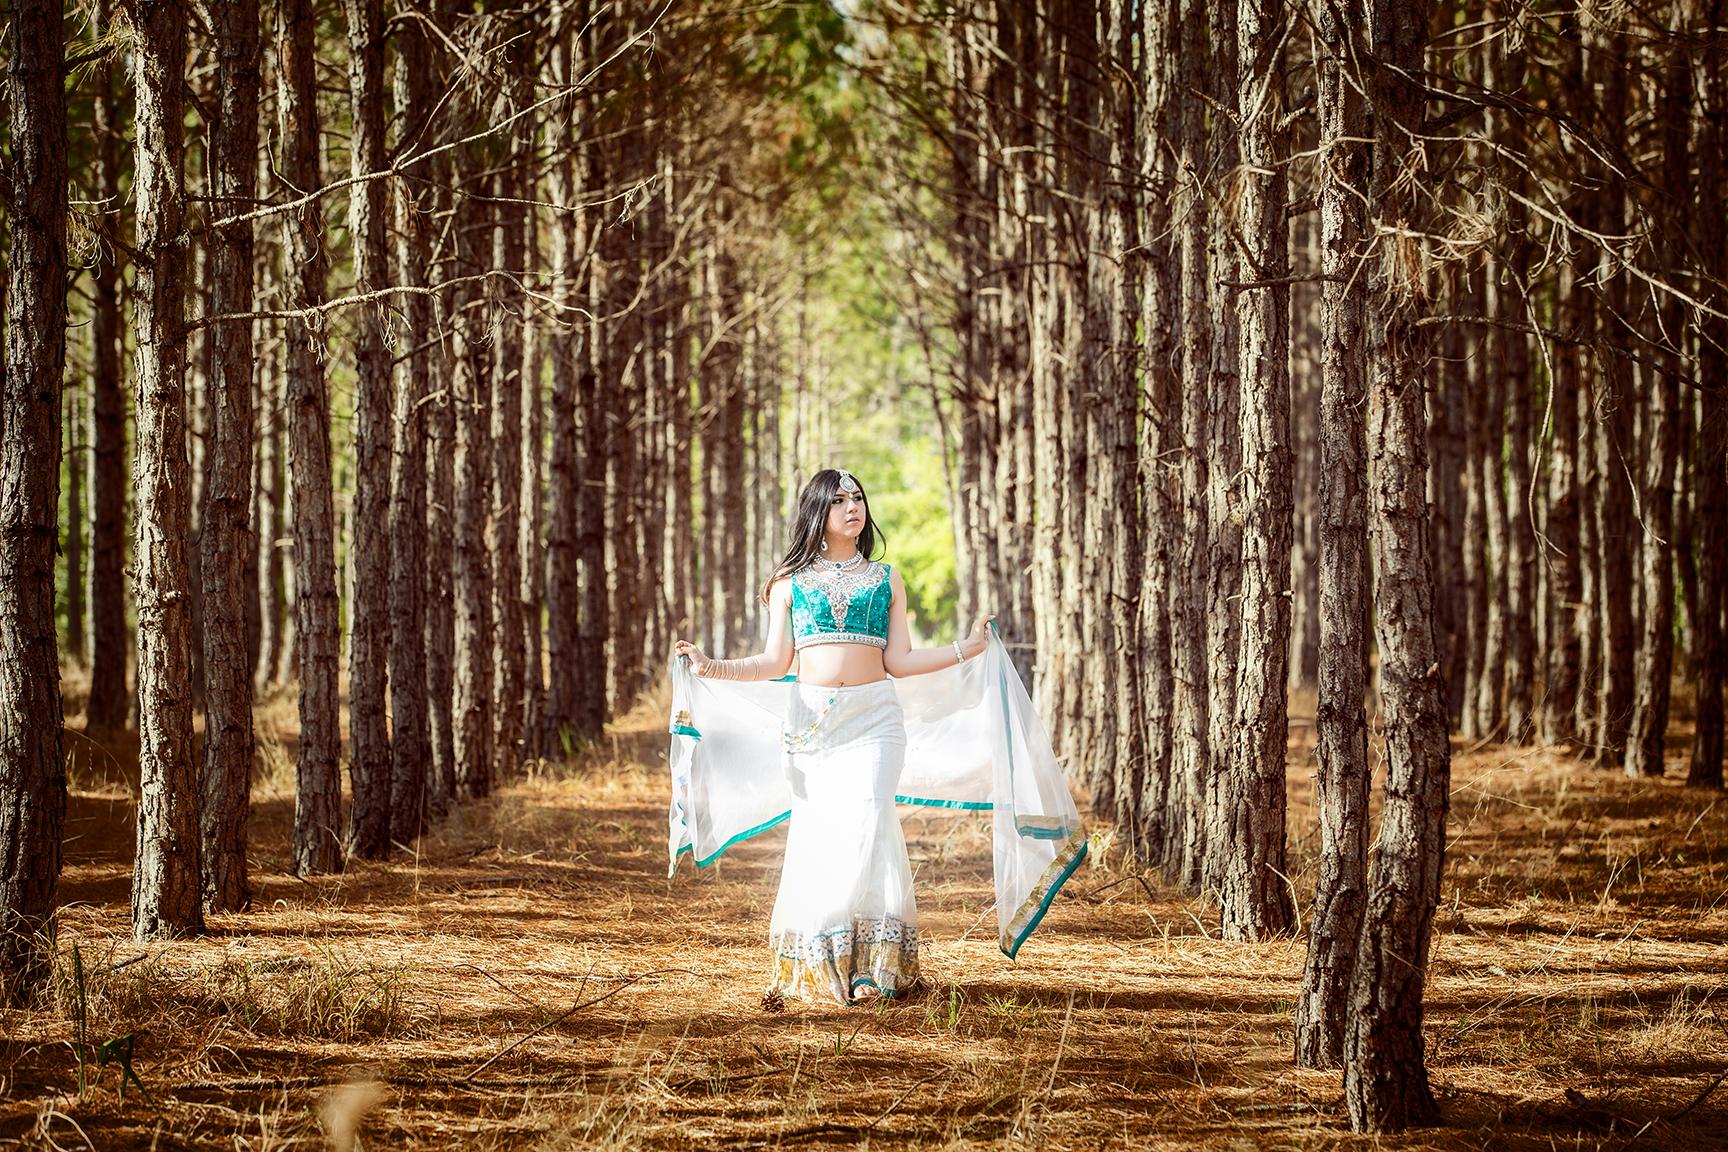 DBatista_Photography_Quinceañera_Caribe_Royale_Orlando_Indian_Photographer_in_Orlando_Florida